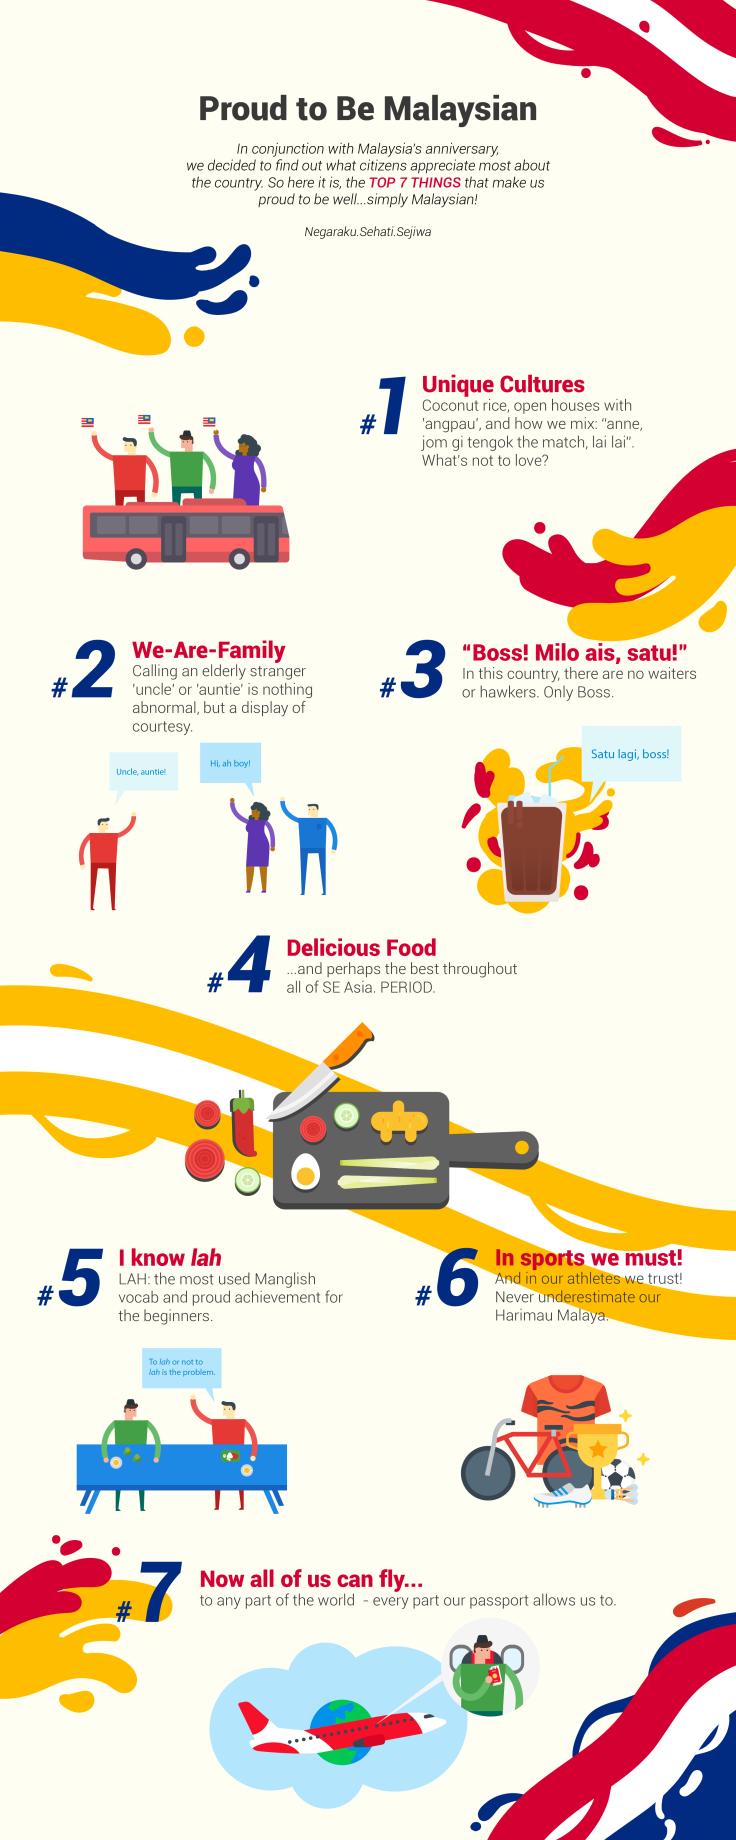 R1 - Merdeka Infographic - Proud to be Malaysian